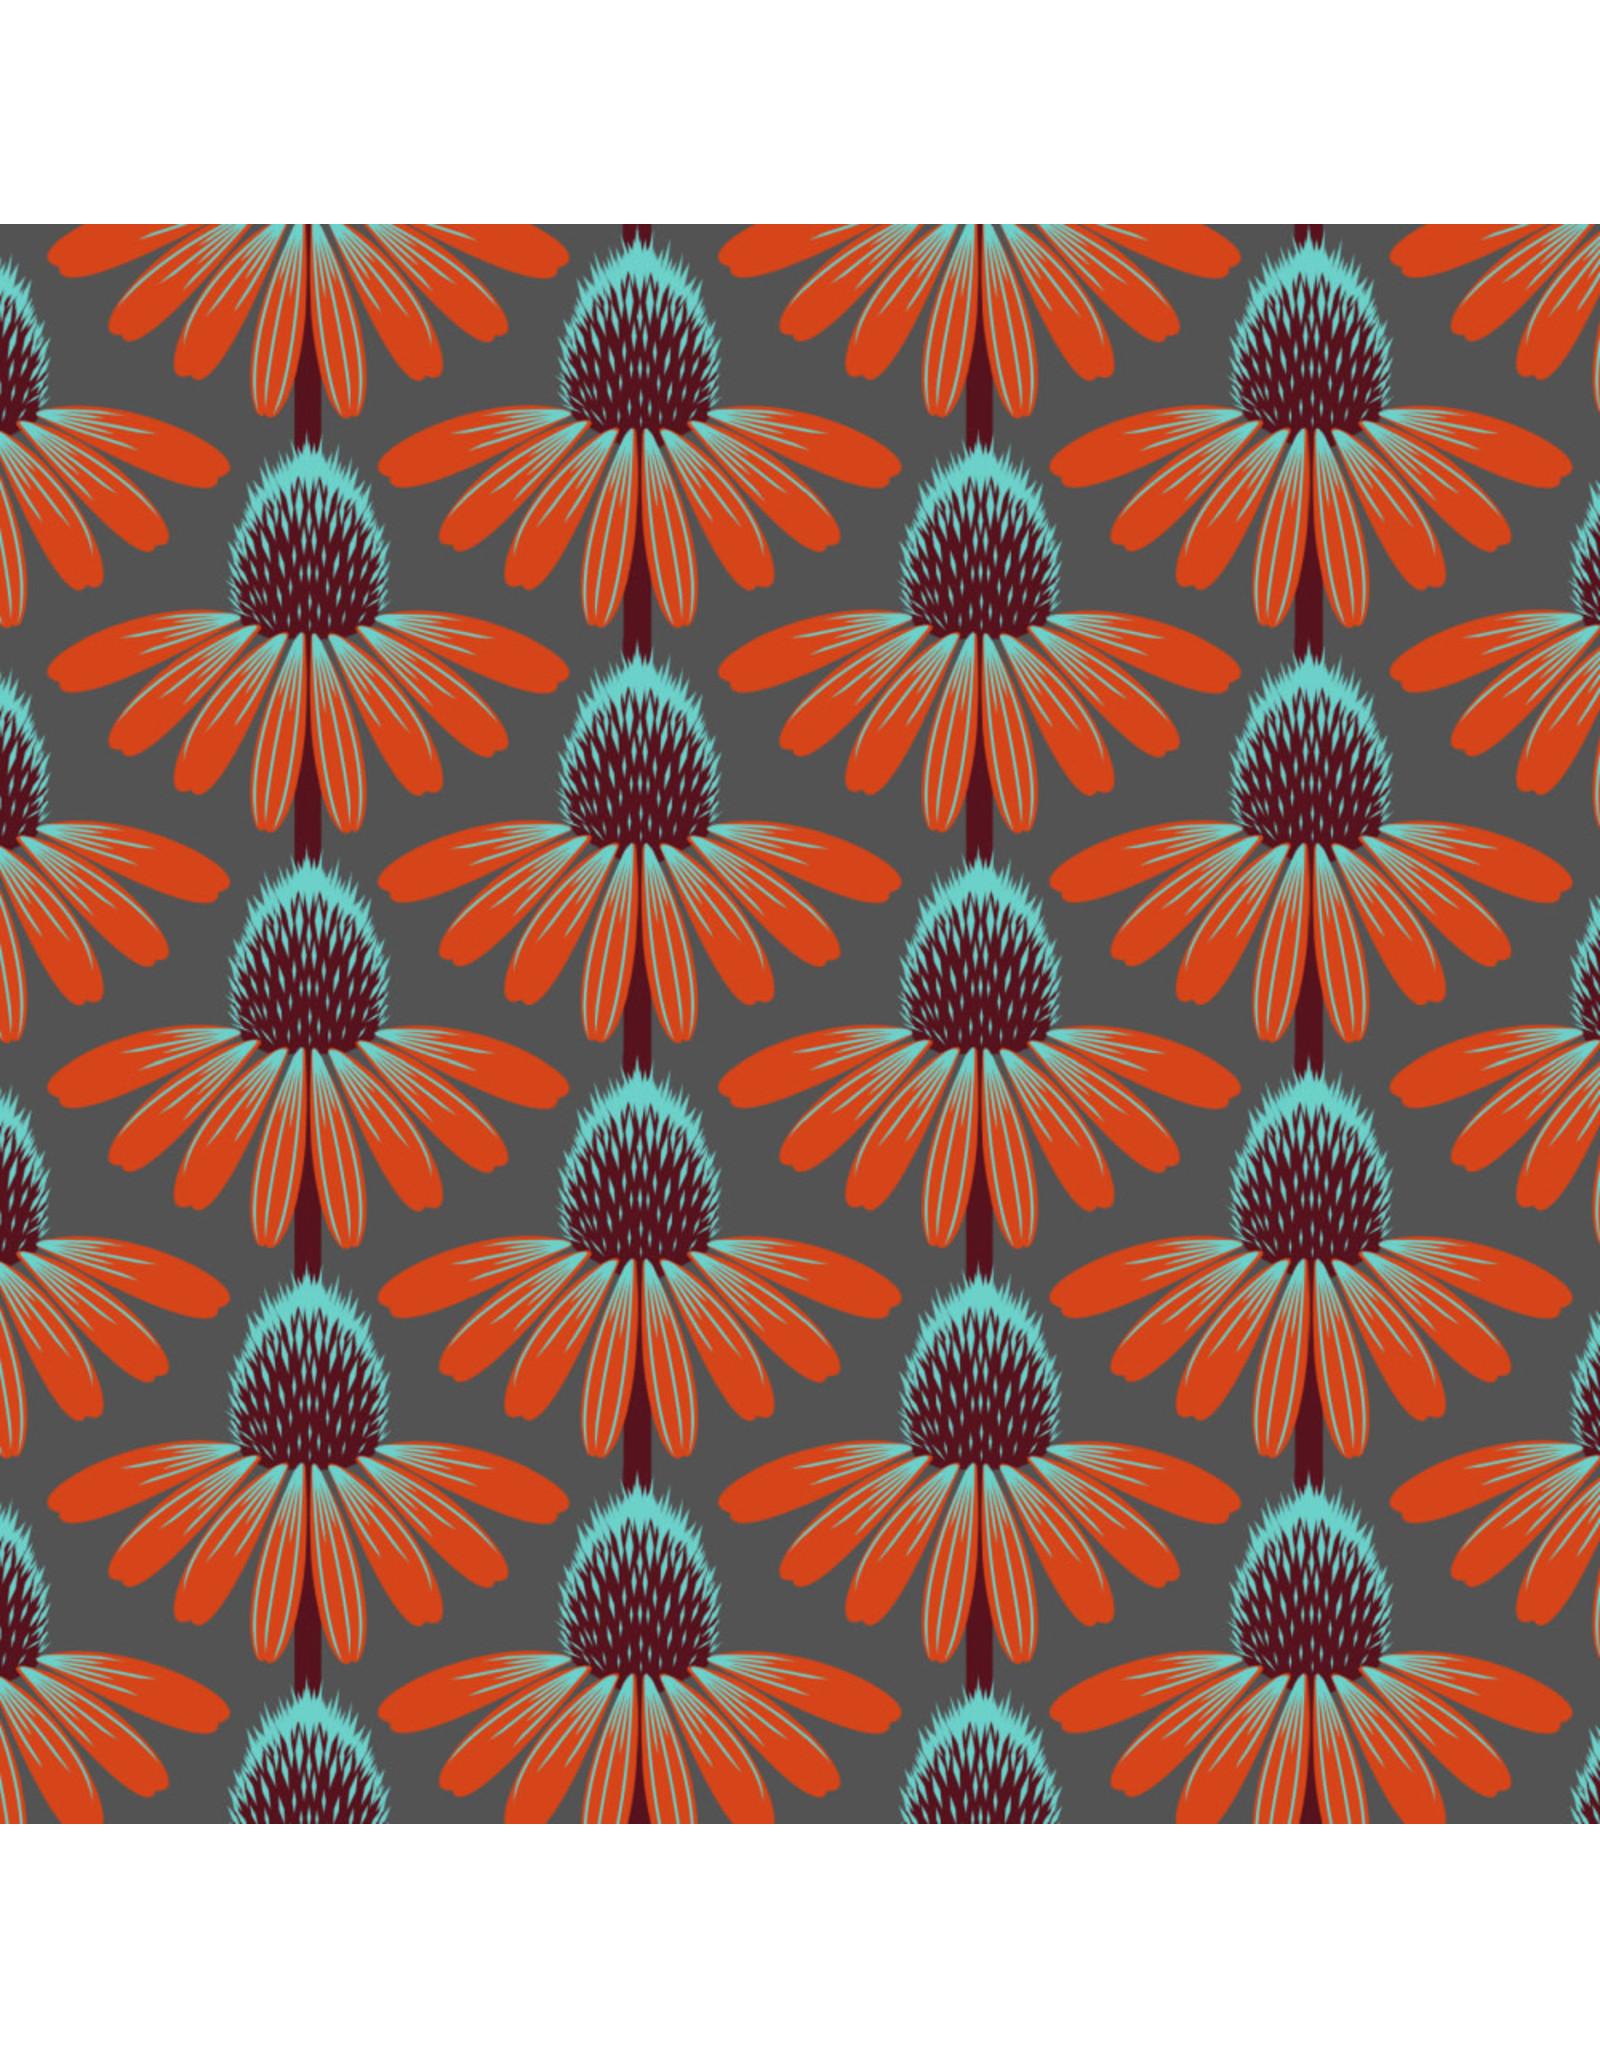 Anna Maria Horner Love Always AM, Echinacea in Berry, Fabric Half-Yards